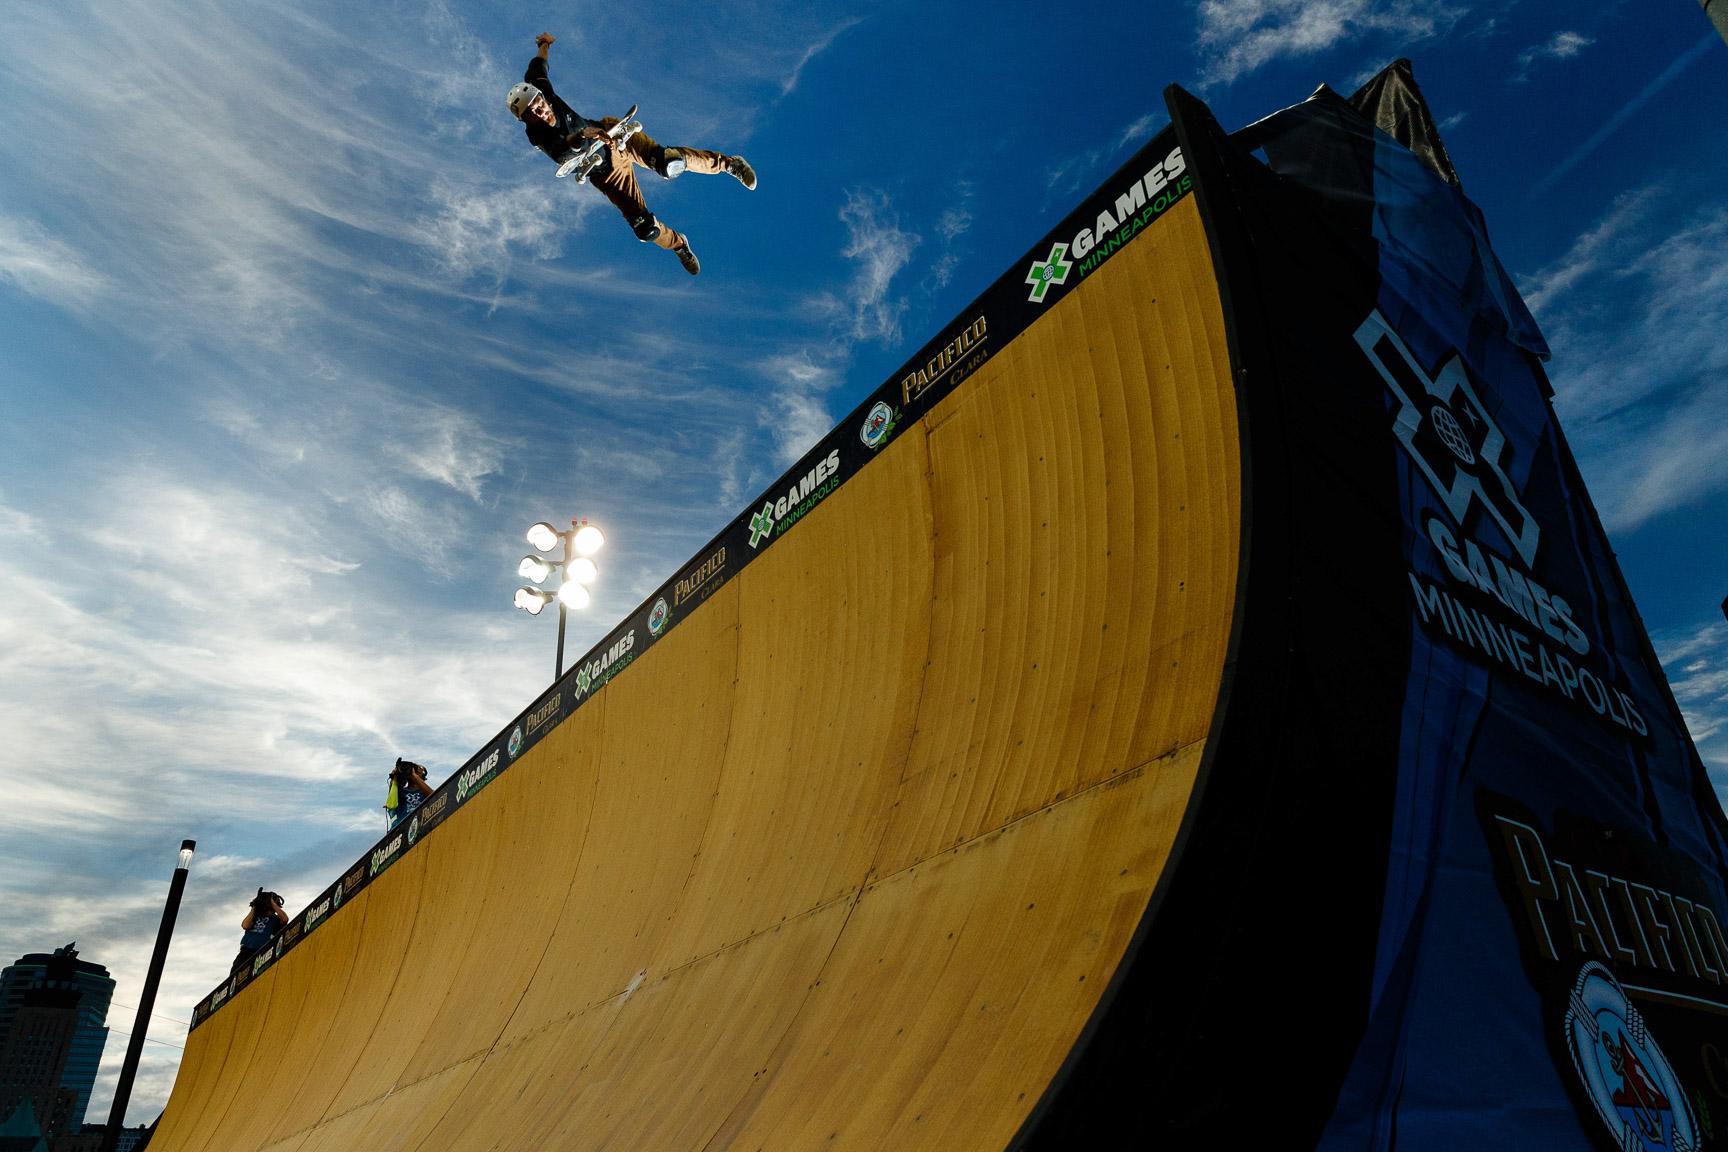 Italo Penarrubia, Skateboard Vert qualifier